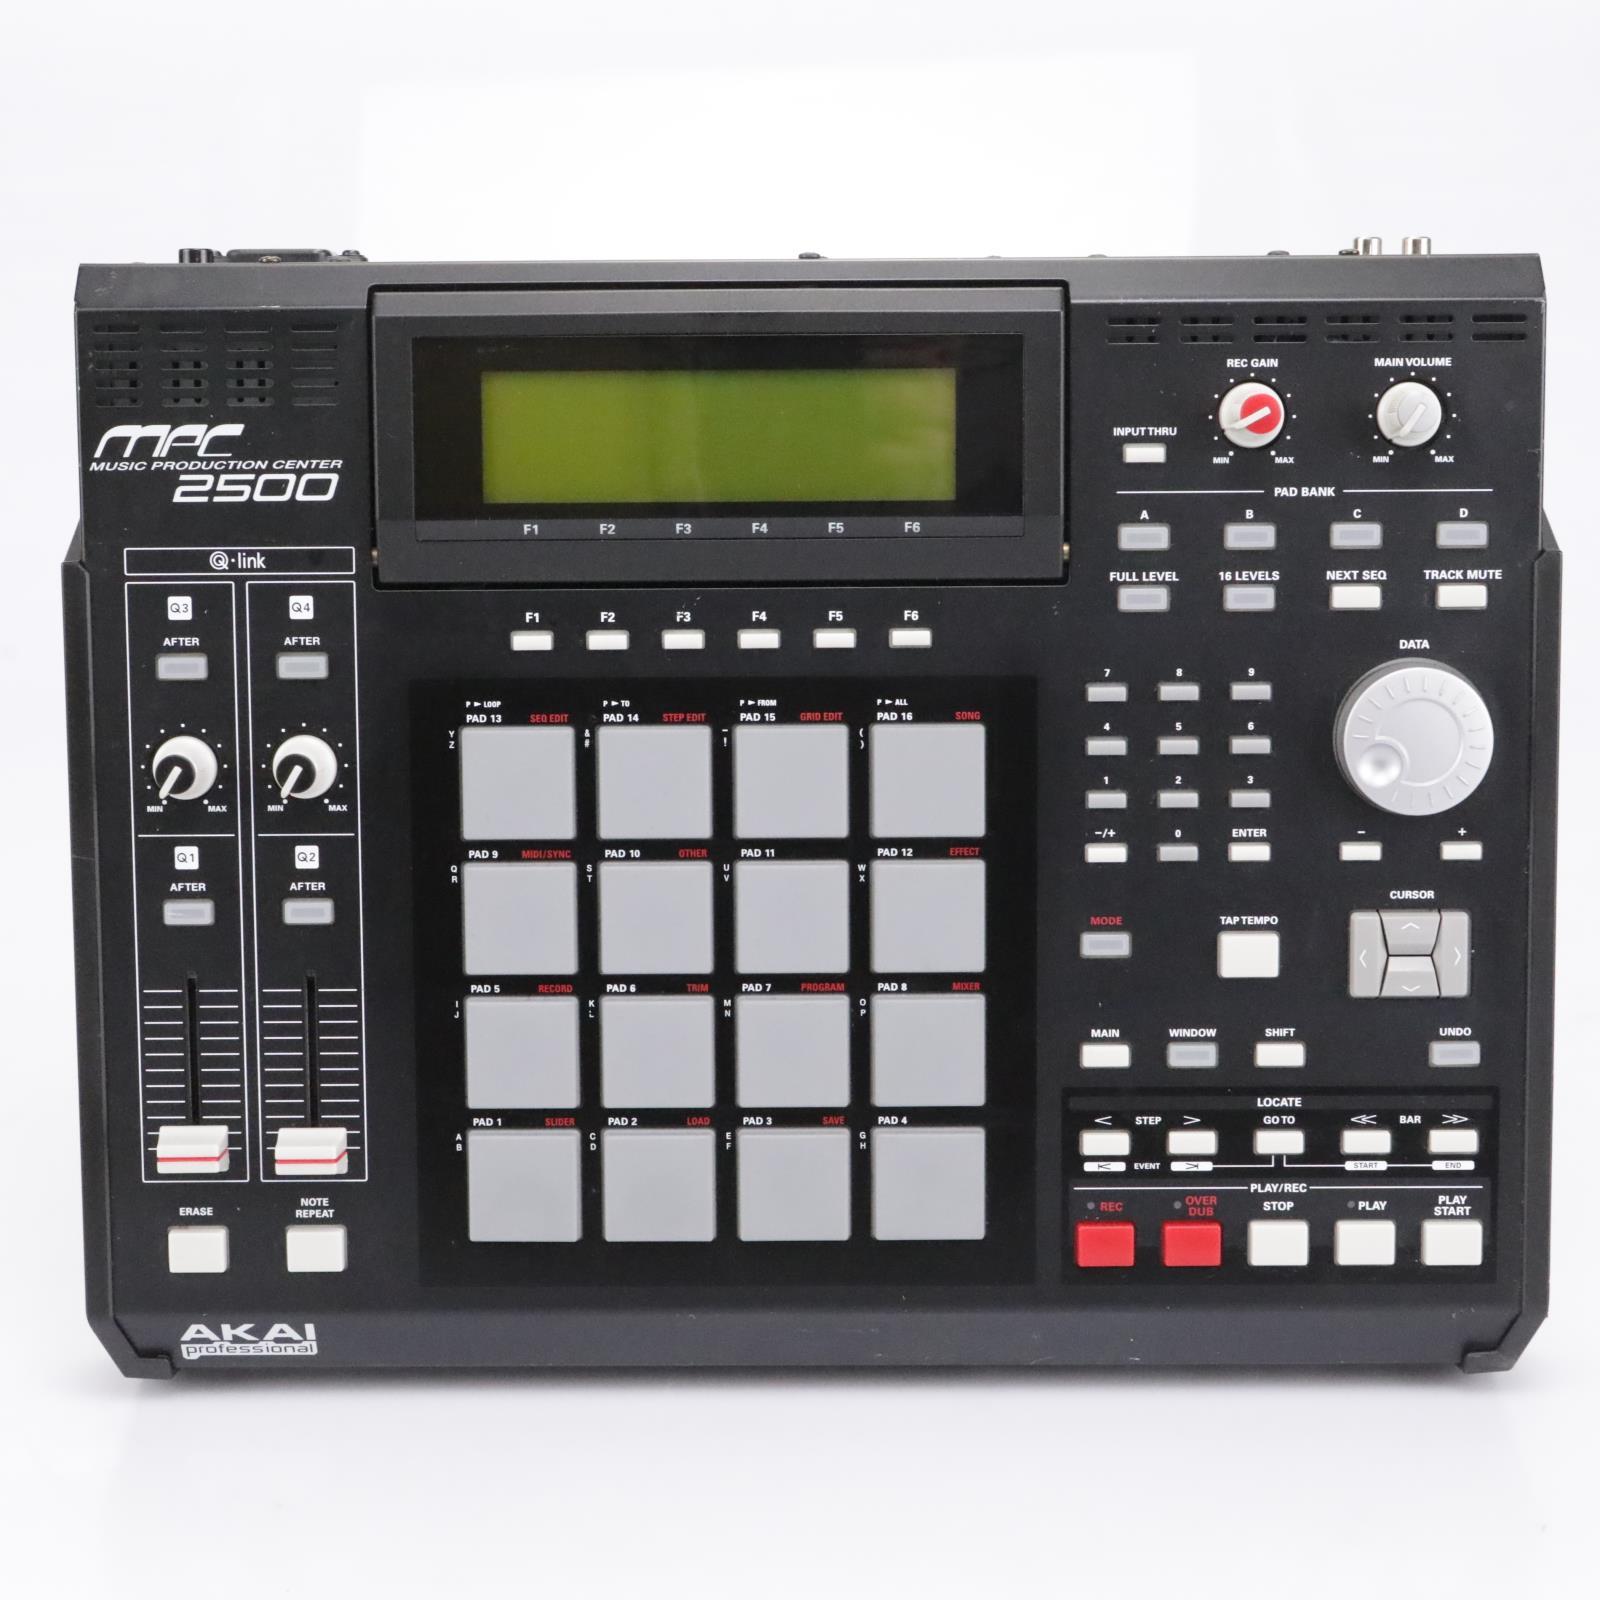 Akai MPC2500 Music Production Center Drum Machine / Sampler #43141